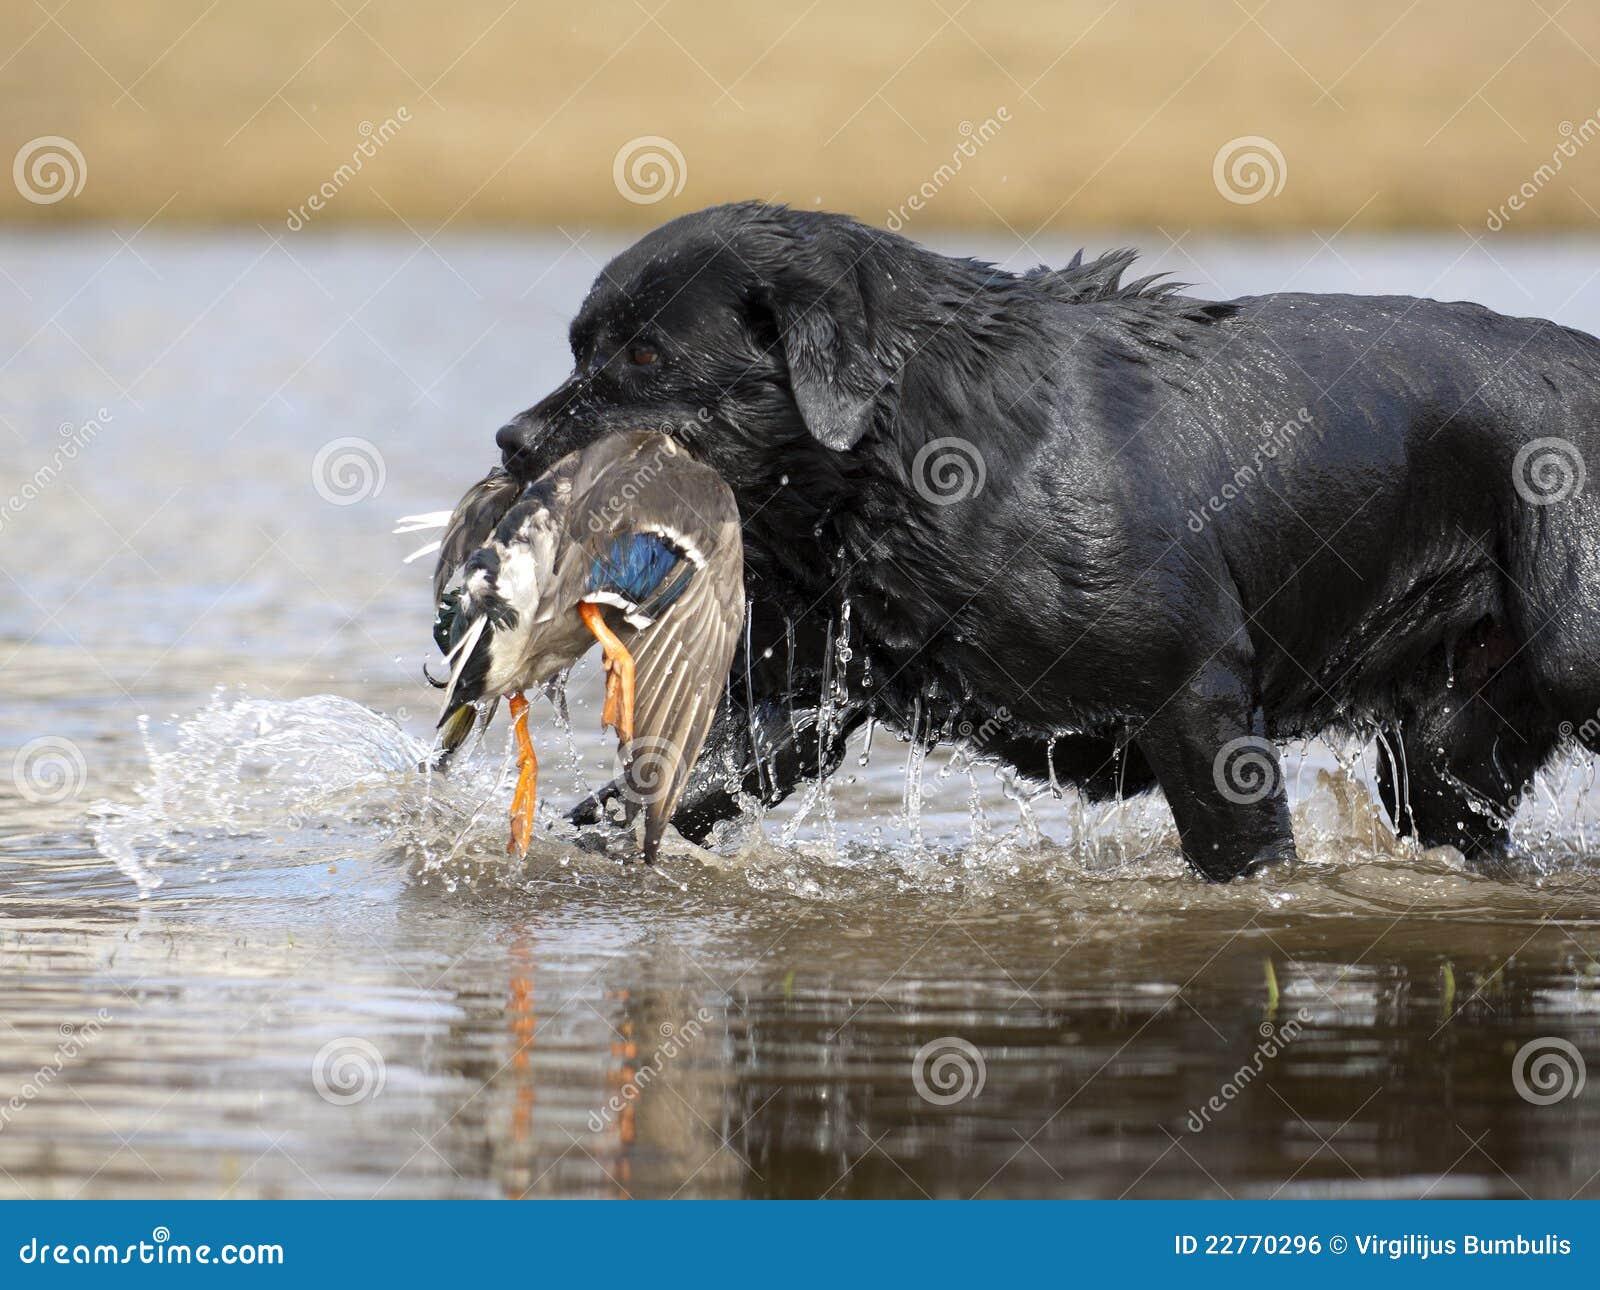 Black Labrador Retriever Hunting Duck Royalty Free Stock Image - Image ...